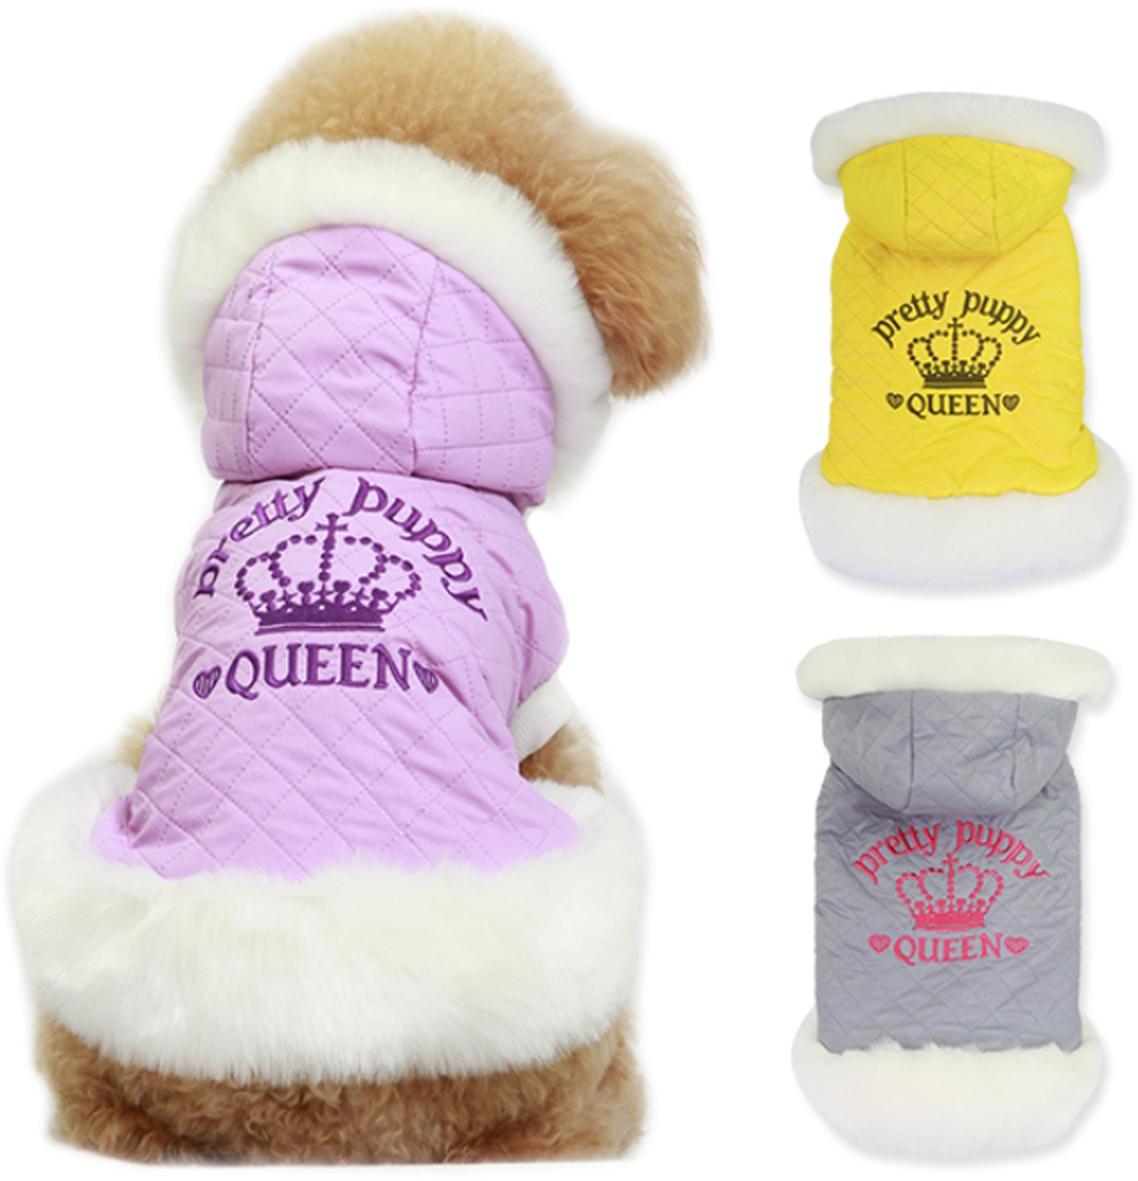 Куртка для собак Dobaz Pretty Puppy, цвет: серый. ДА14068ВХС. Размер XS куртка для собак dobaz цвет серый черный да1222вхс размер xs